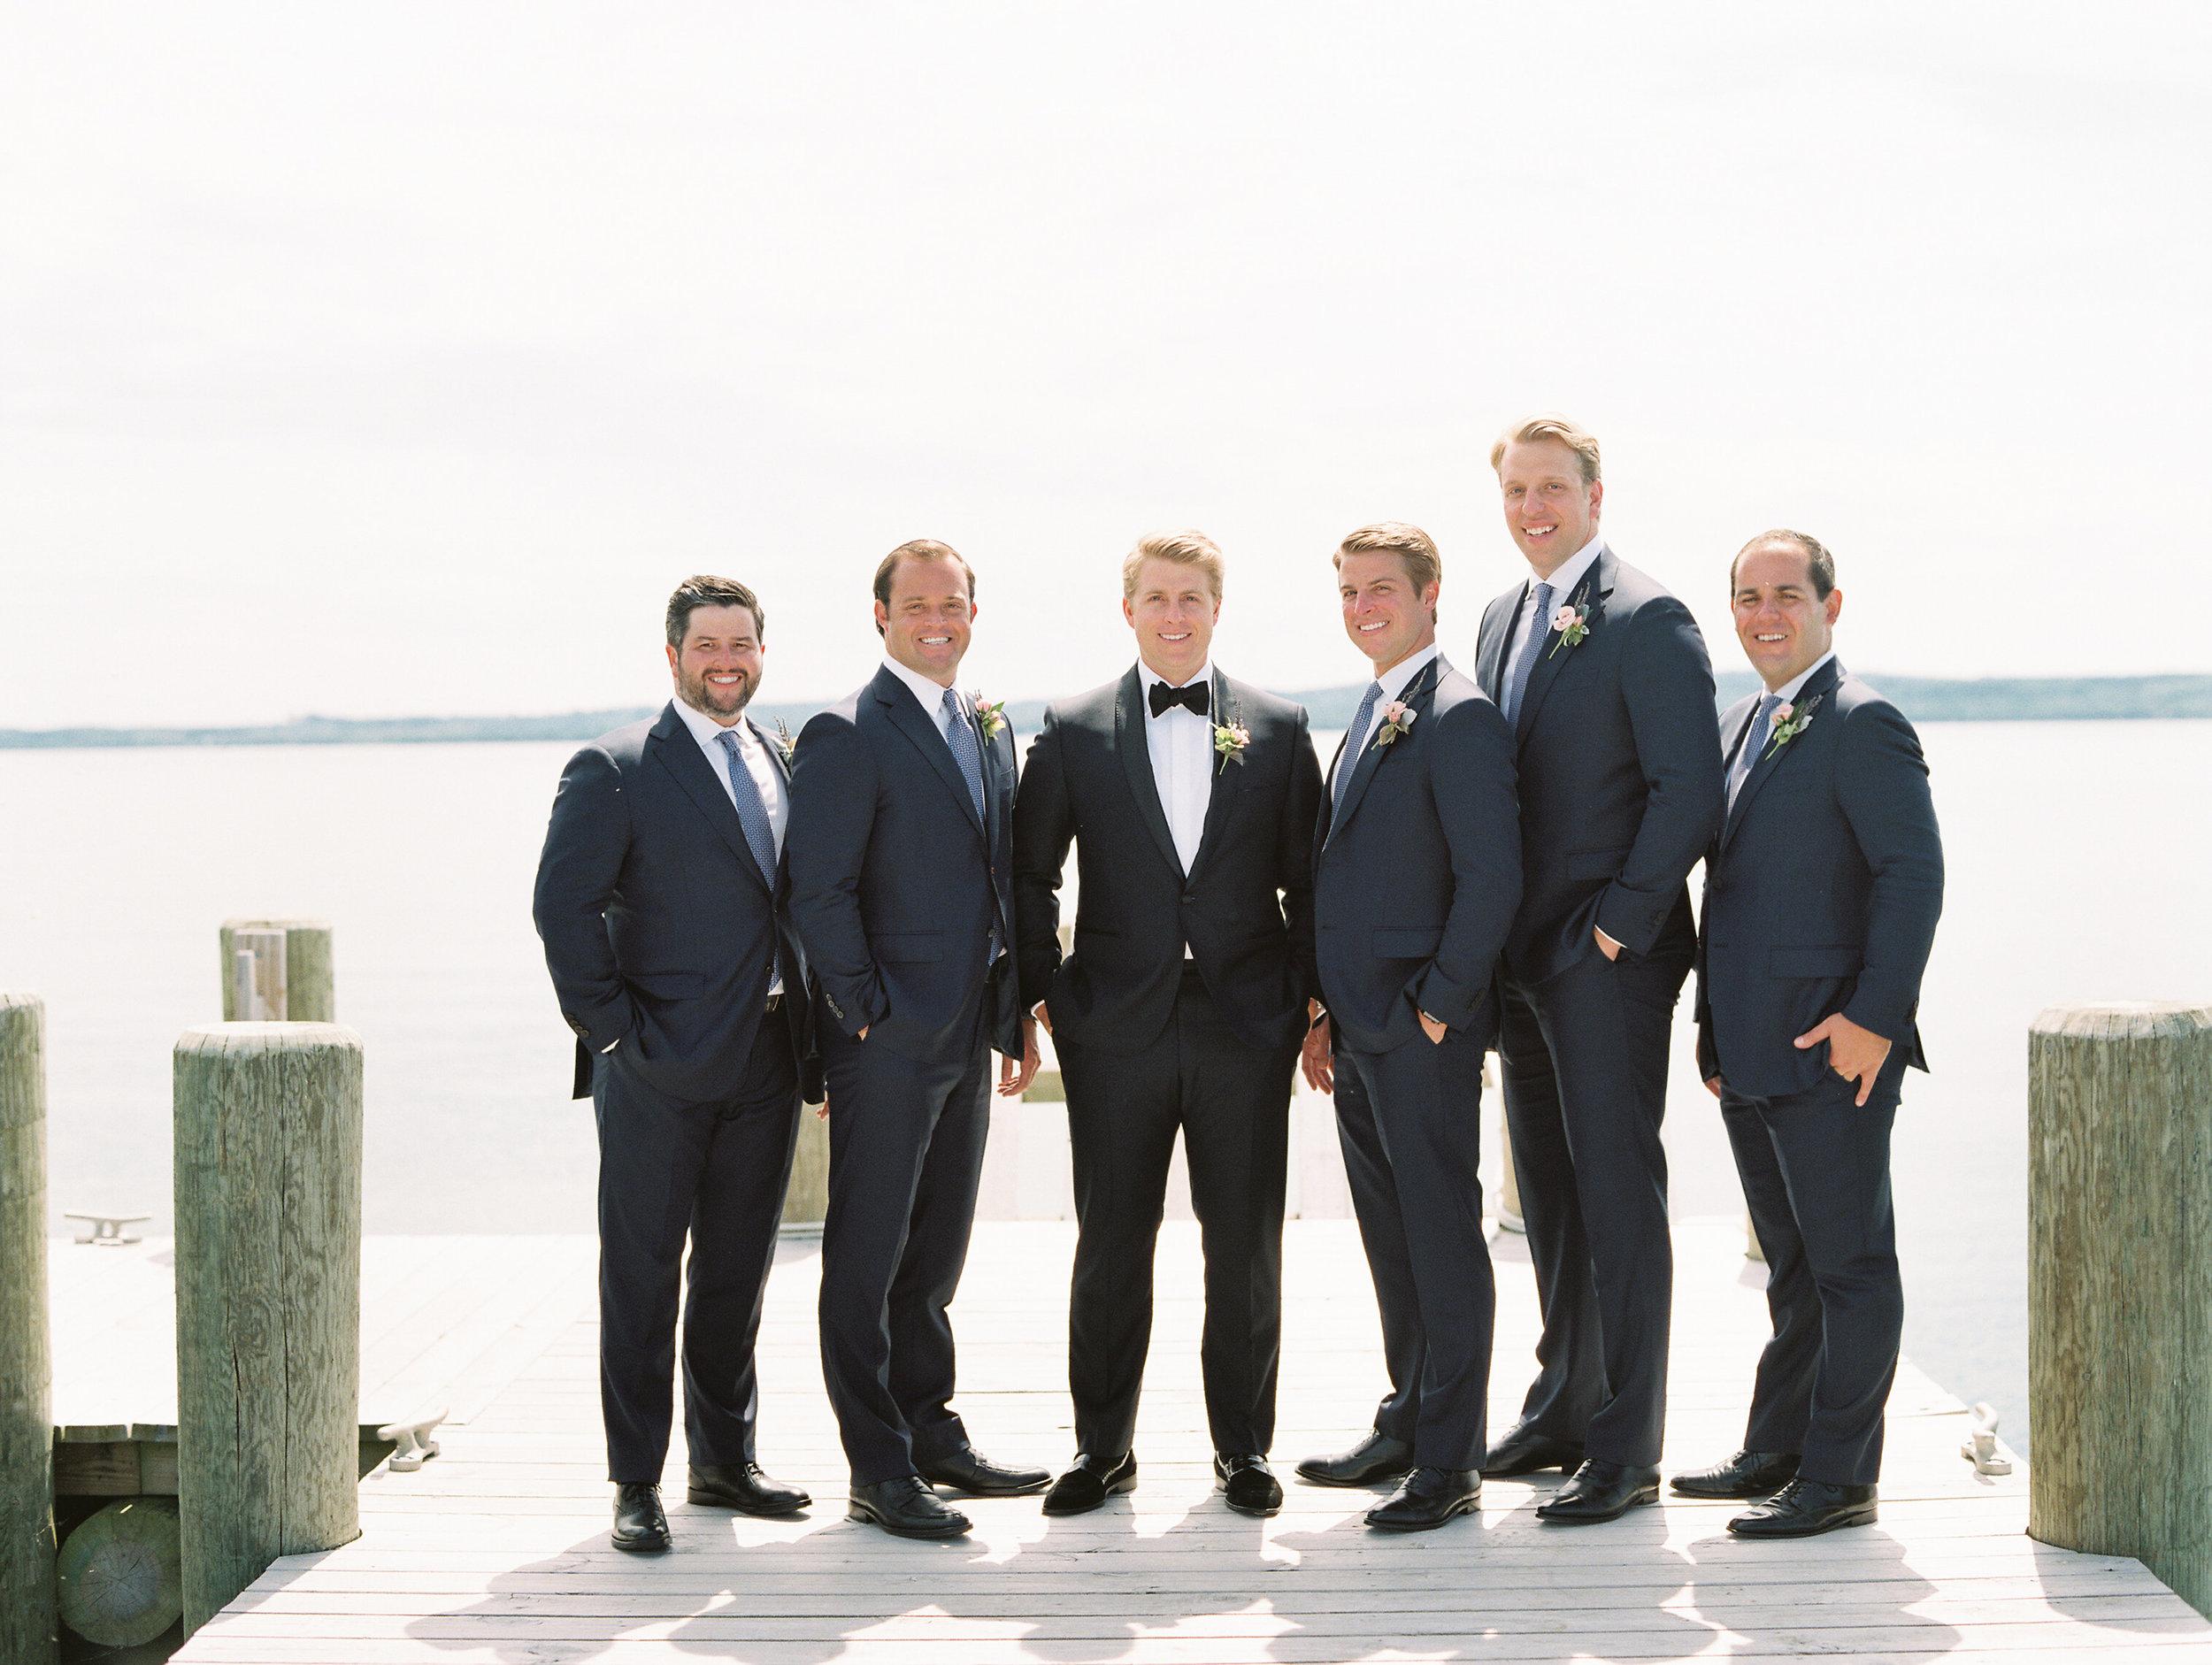 Coffman+Wedding+Bridal+Party-5.jpg